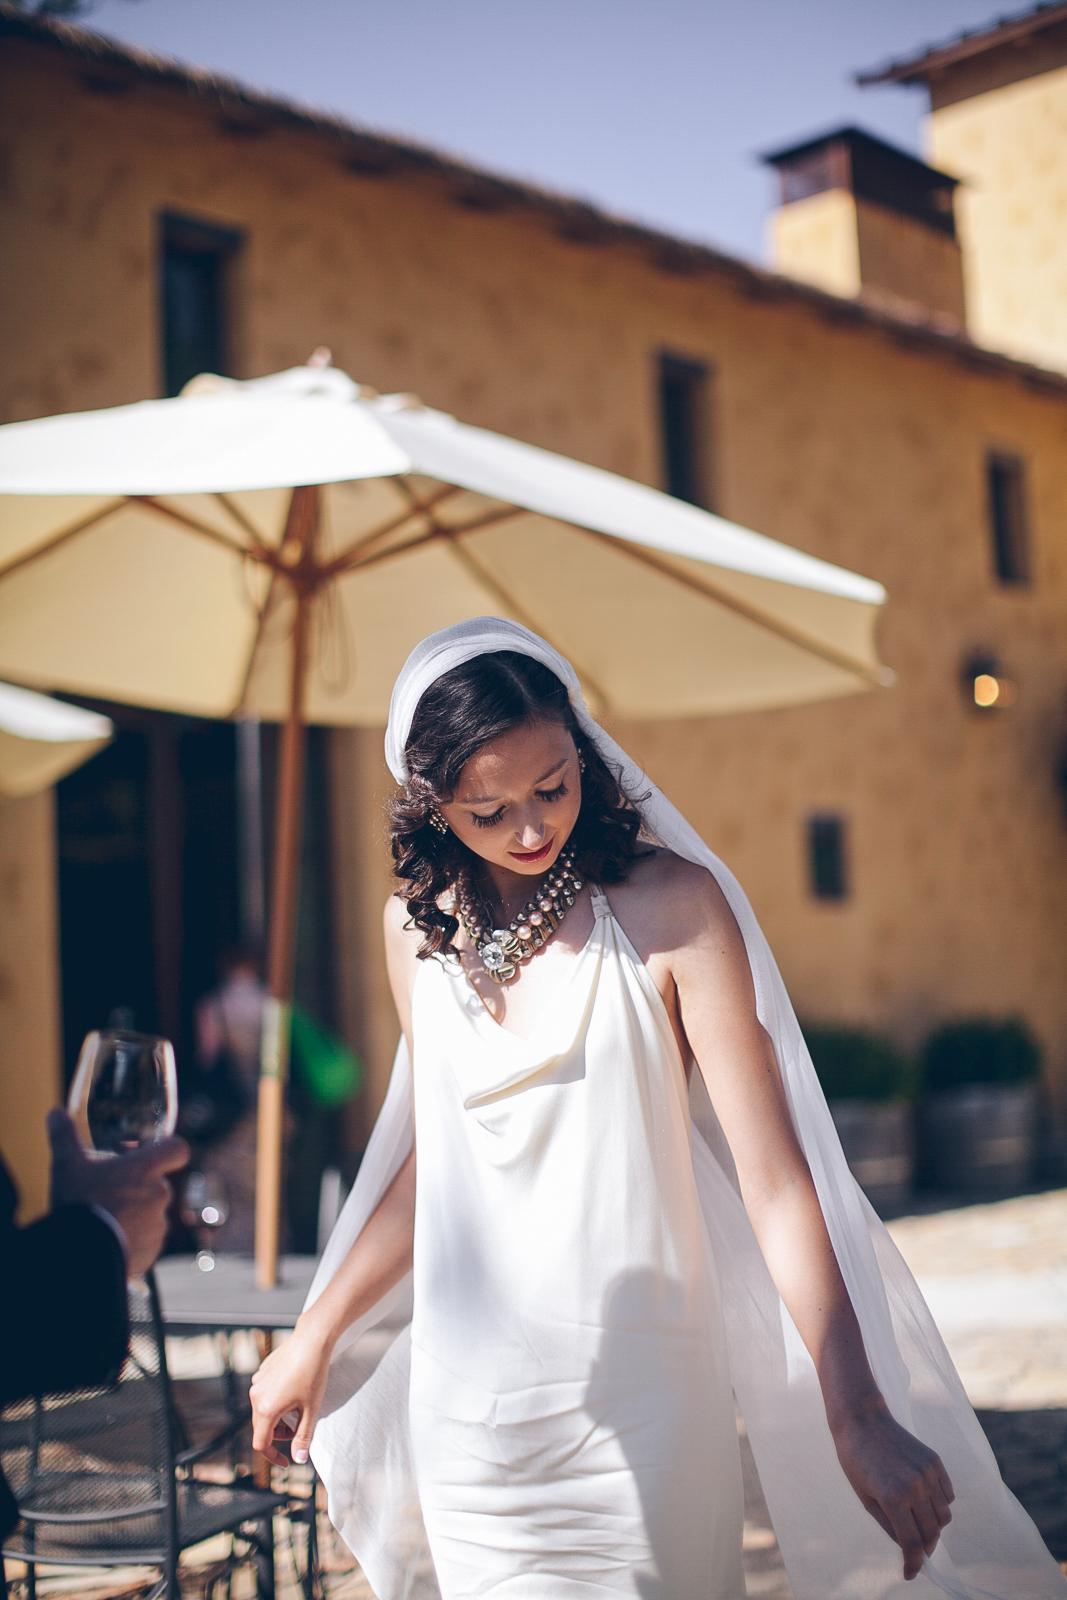 miraflores_winery_wedding_photography_ian_melissa_ebony_siovhan_bokeh_photography_03.jpg